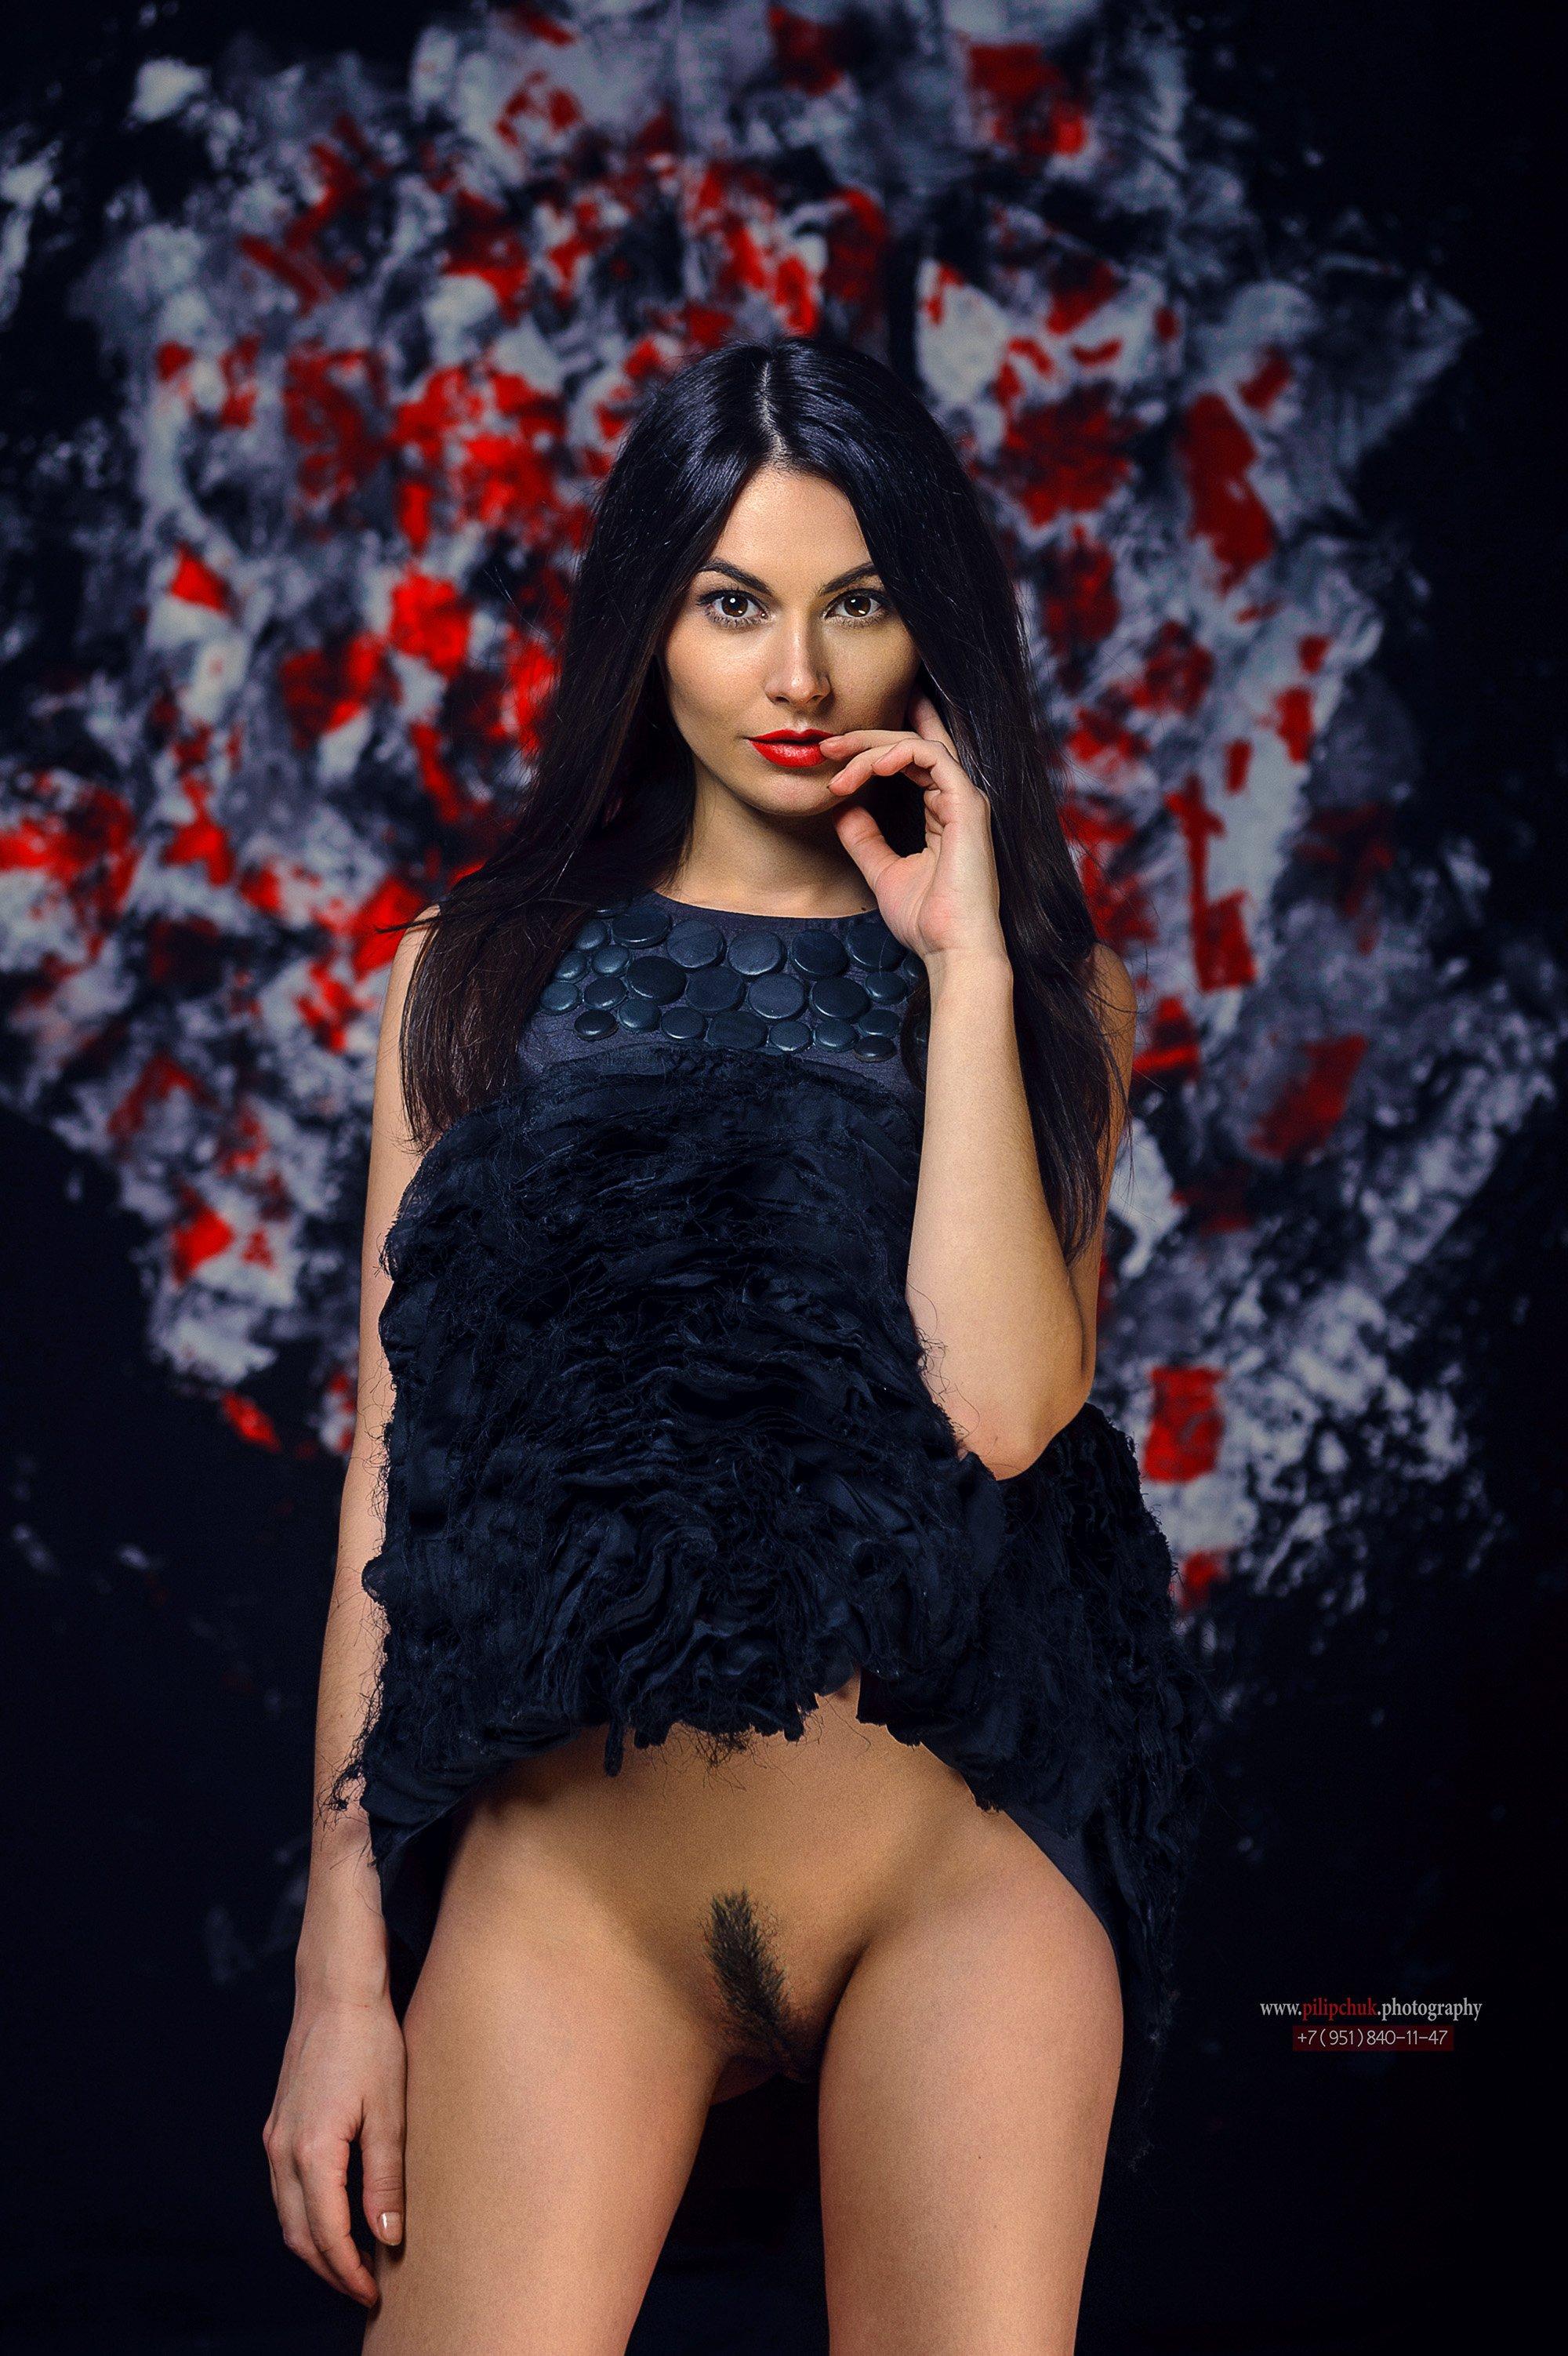 ню , фото девушки, обнаженная девушка, Пилипчук Константин